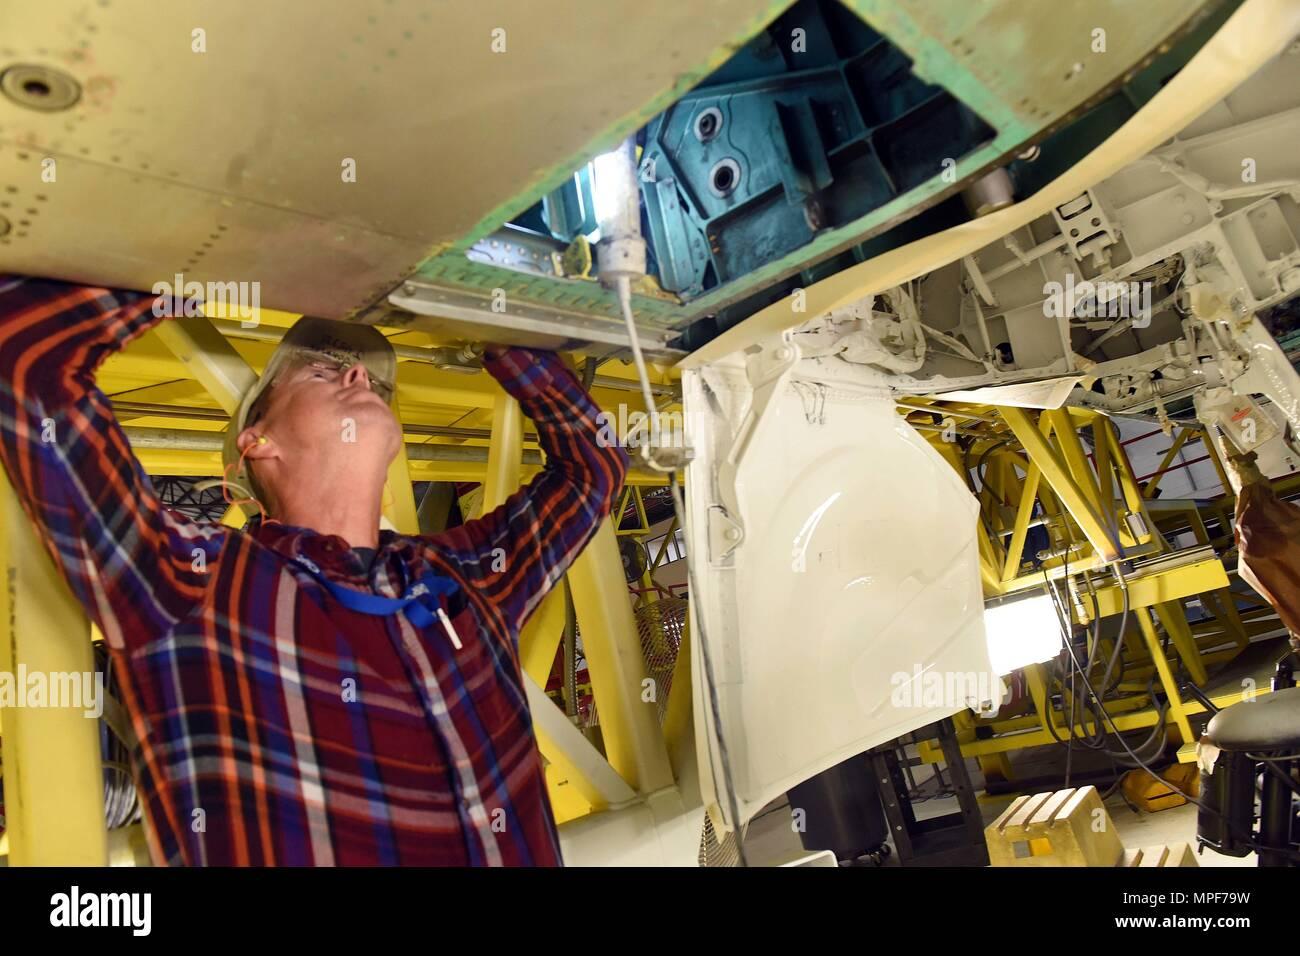 hight resolution of wiring harness stock photos u0026 wiring harness stock images alamykenneth johnson 561st aircraft maintenance